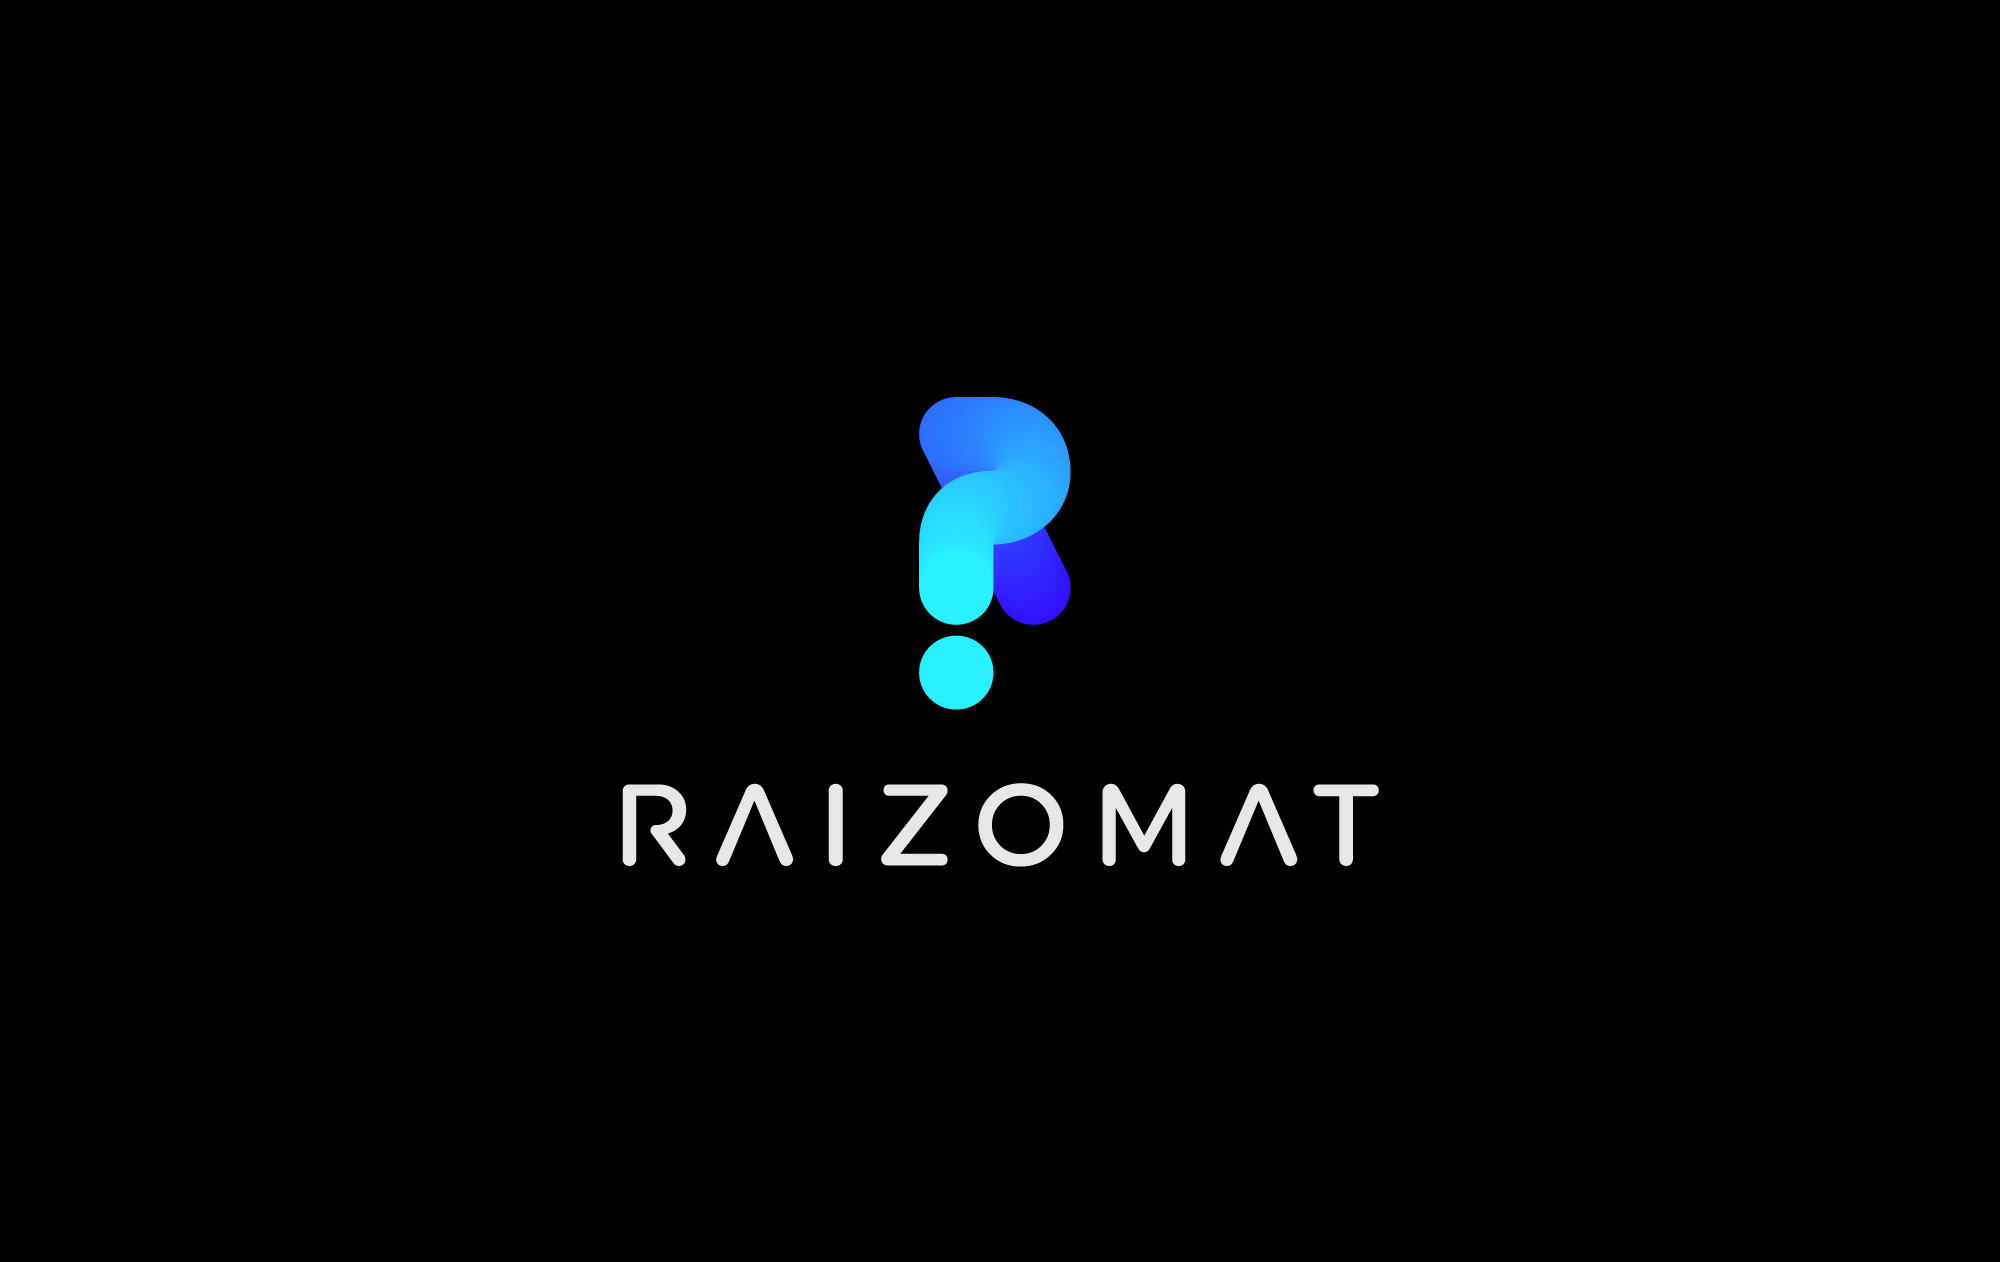 Raizomat-Logo-V-BlackBG-2K-q80-01